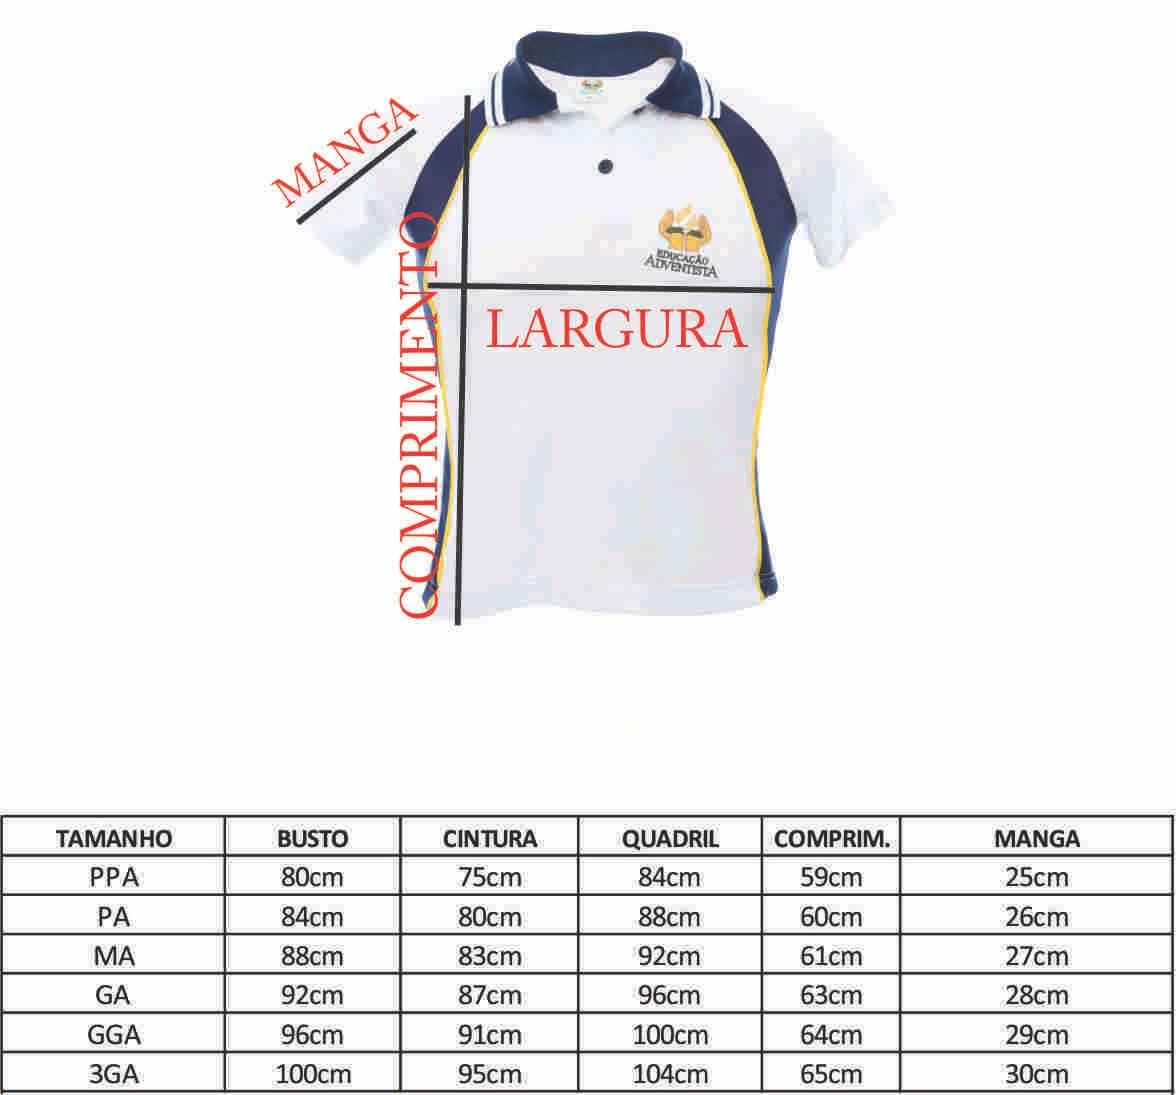 Camiseta Baby Luck - Ens. Médio -  3GA